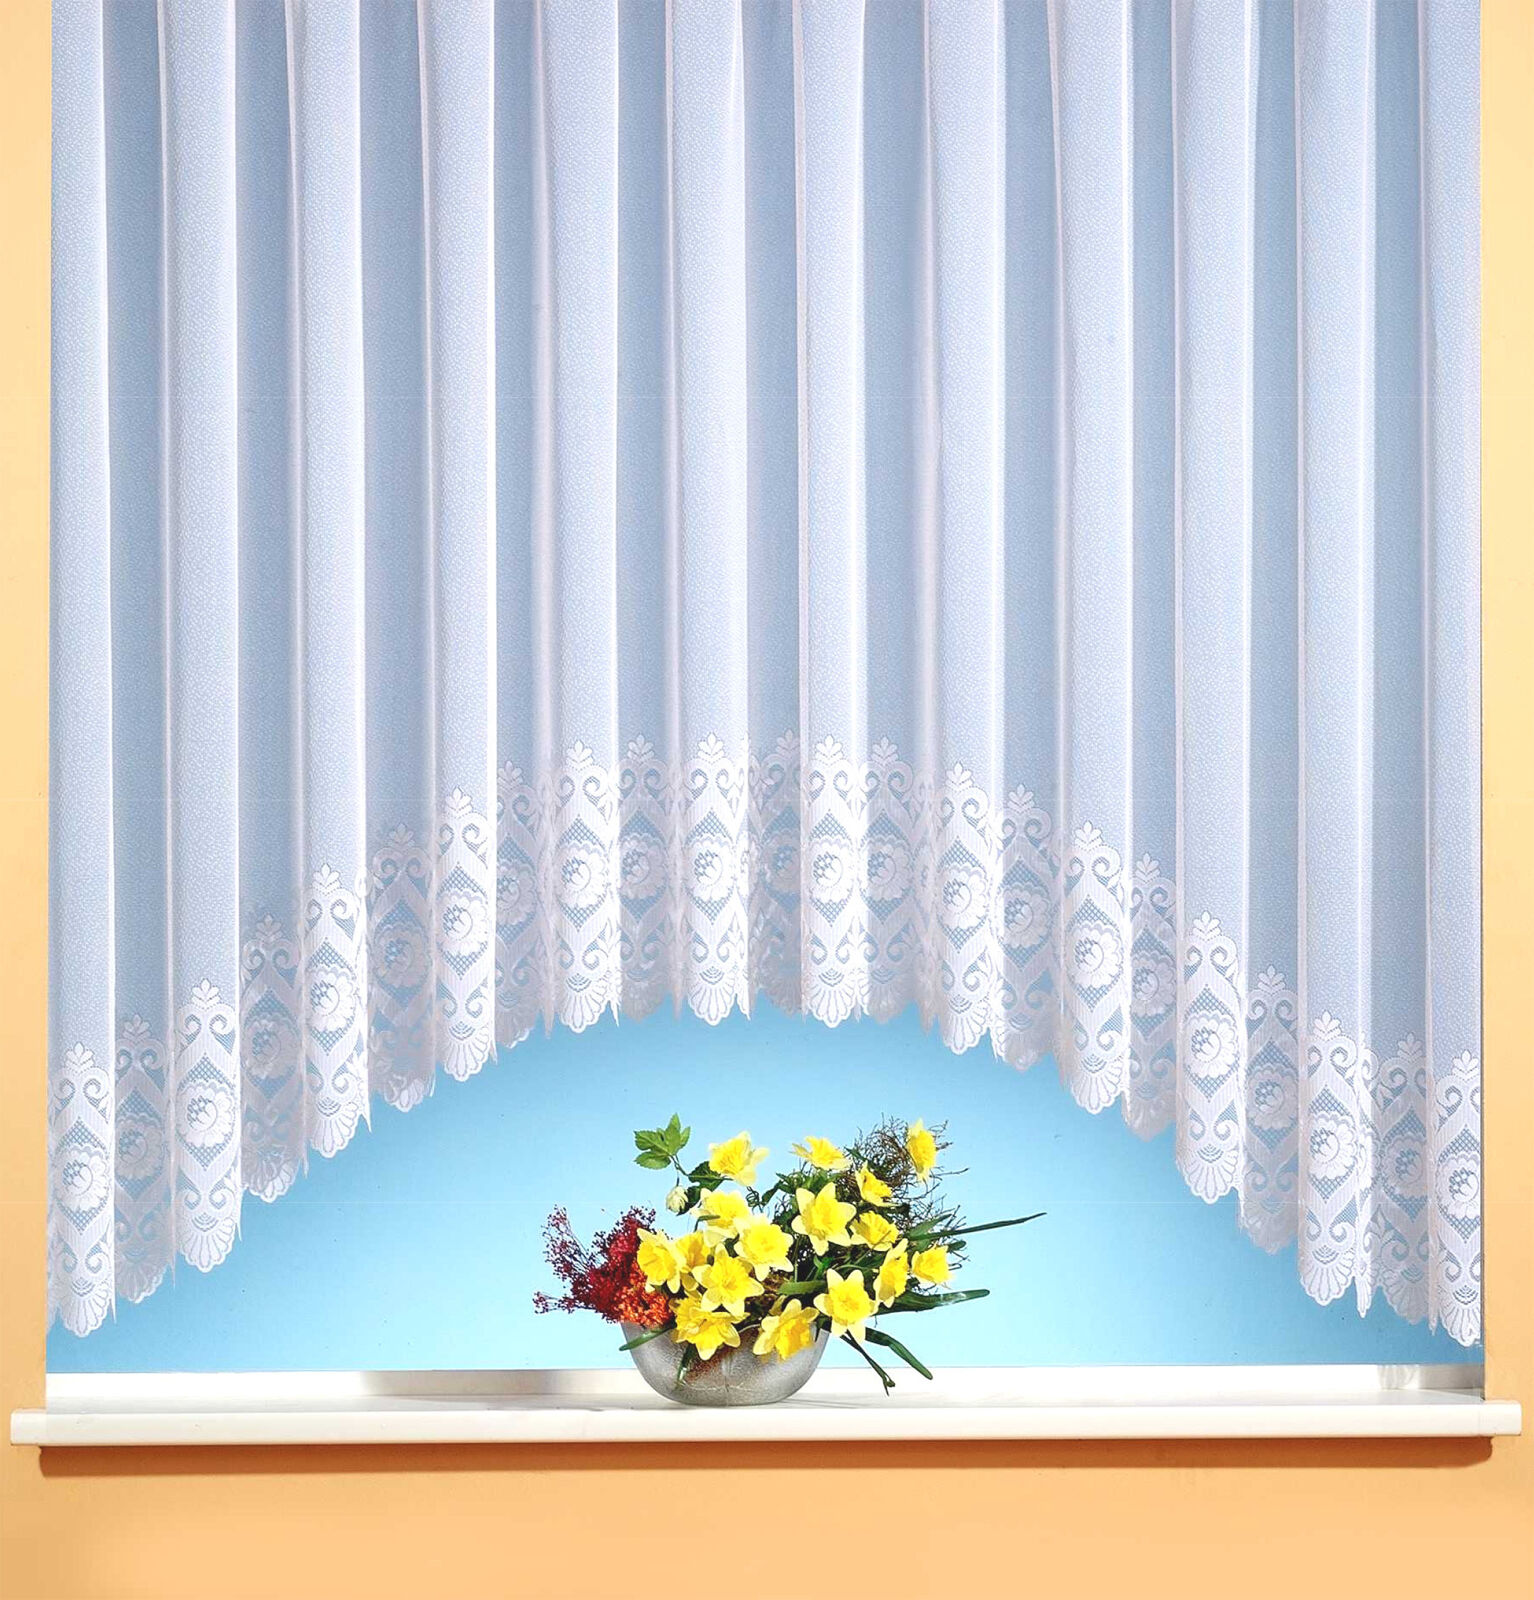 blumenfenster mehr als 50 angebote fotos preise. Black Bedroom Furniture Sets. Home Design Ideas